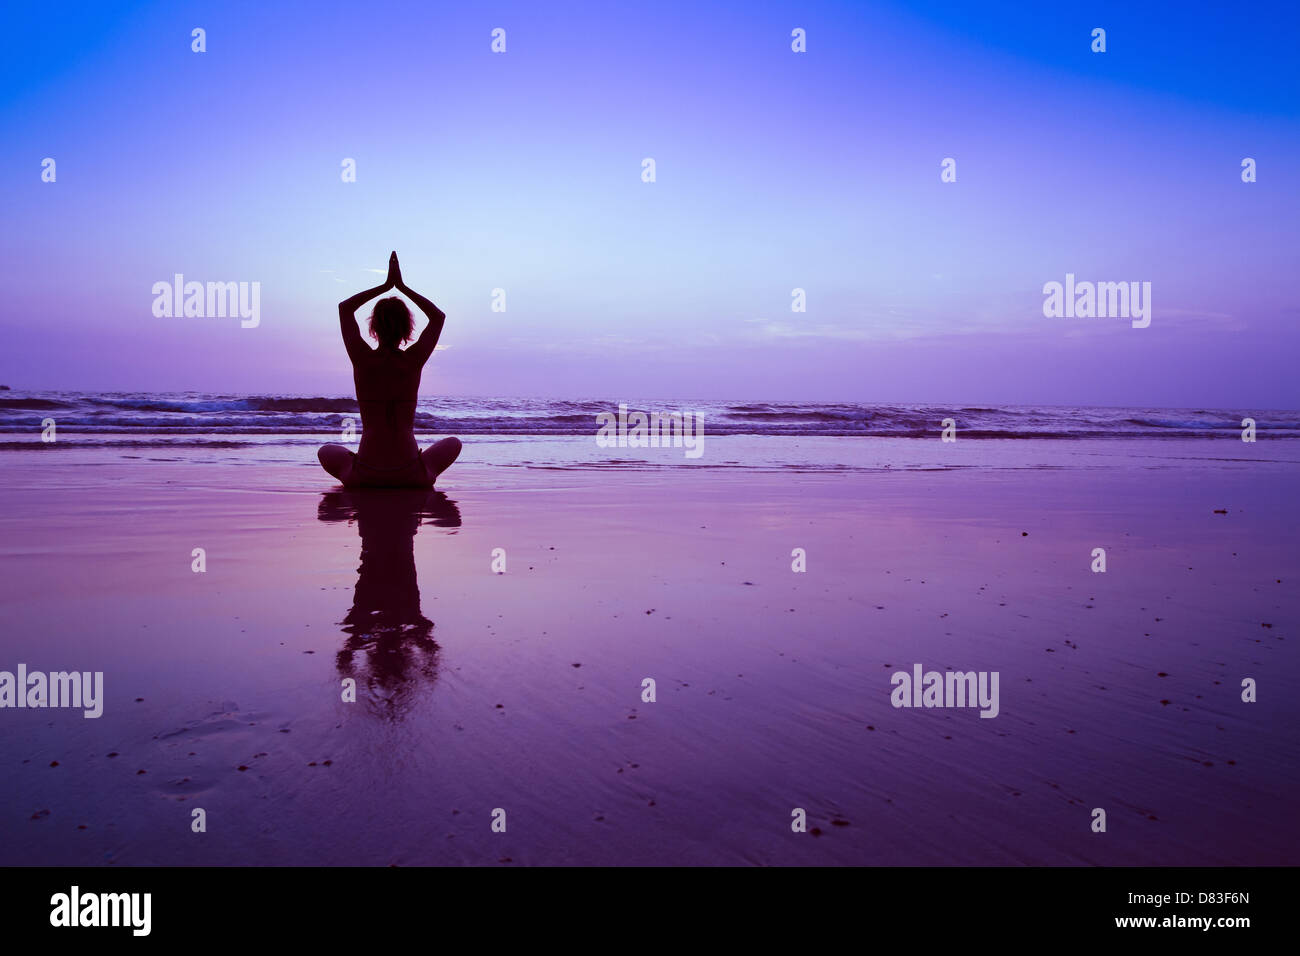 yoga on the beach, meditation - Stock Image